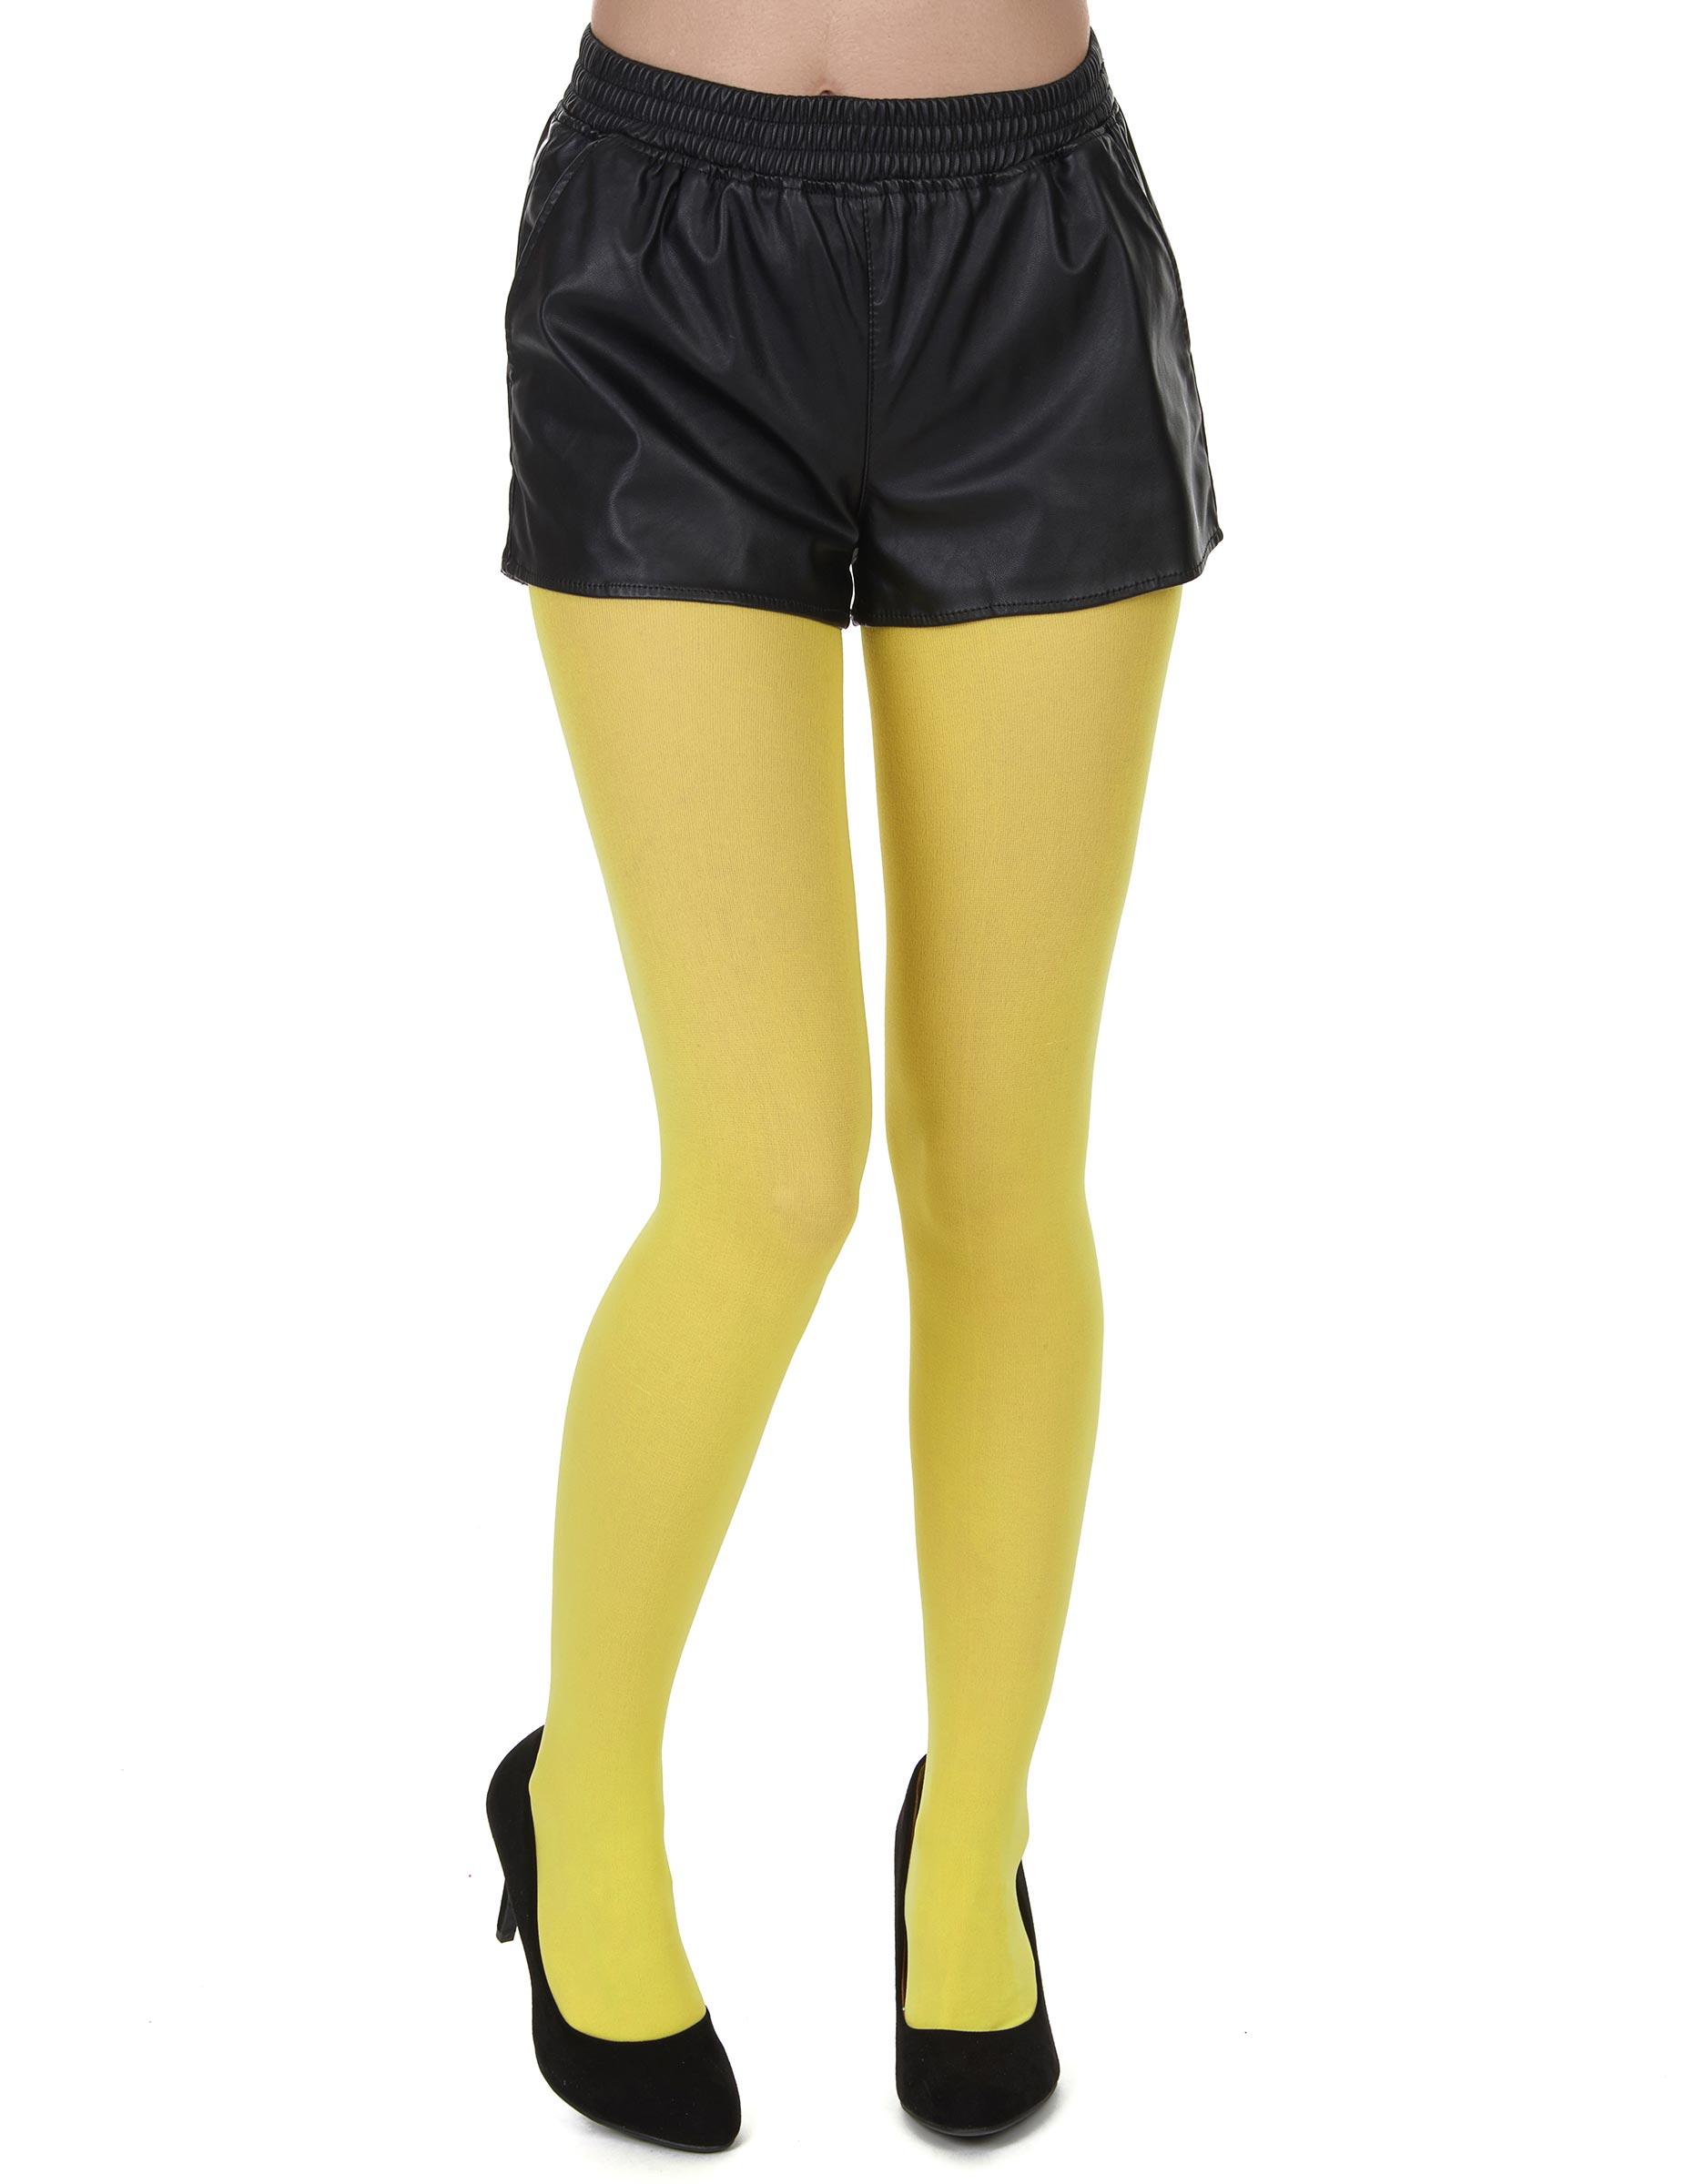 Collants opaques jaunes adulte 1319586a1b4